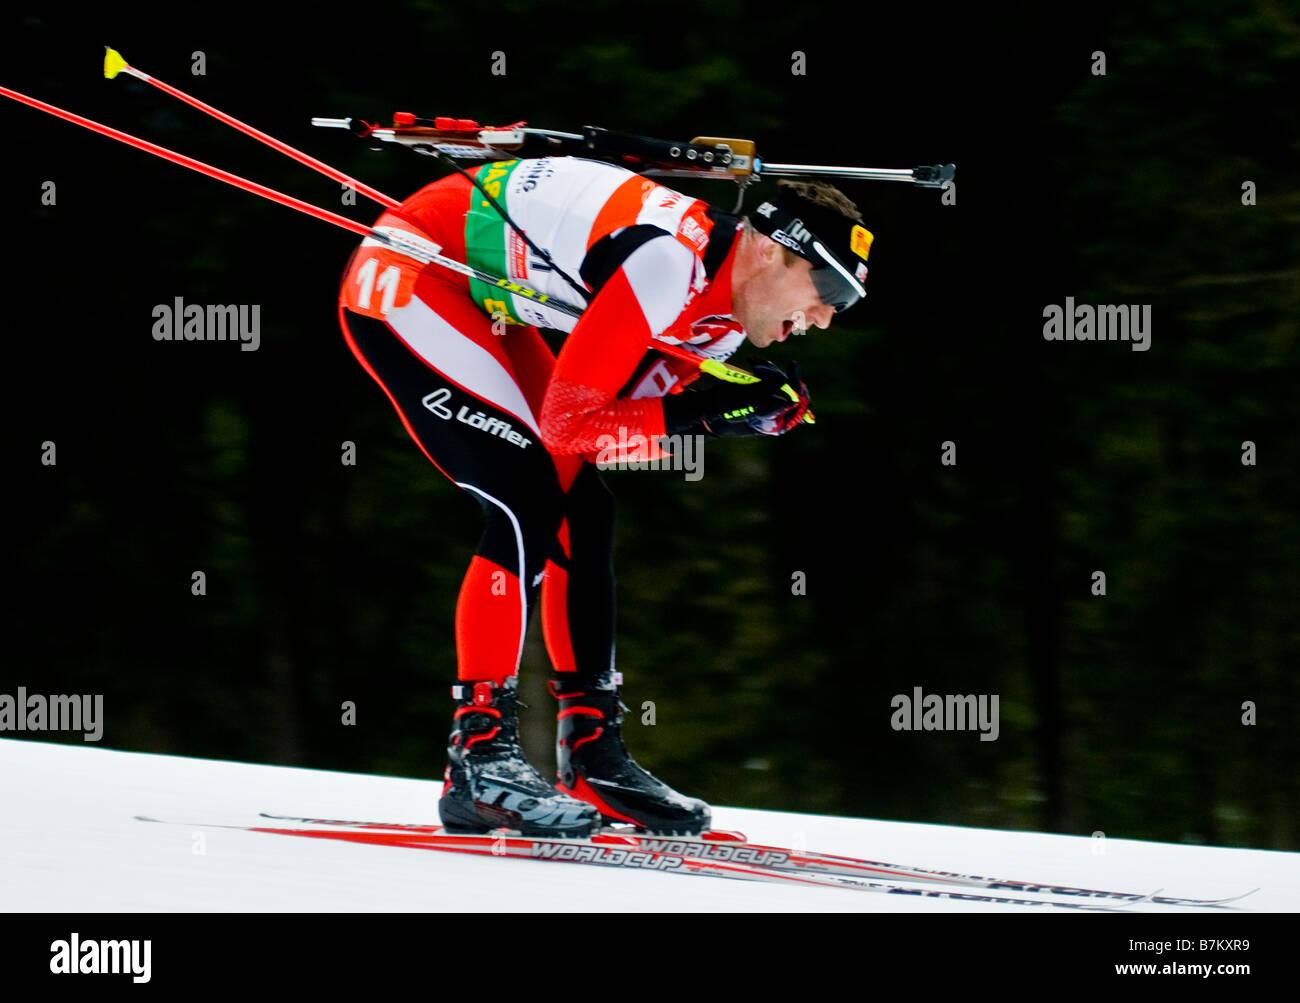 SUMANN Christoph Österreich Biathlon Weltcup Verfolgung Frauen Männer Ruhpolding 18 1 2009 - Stock Image